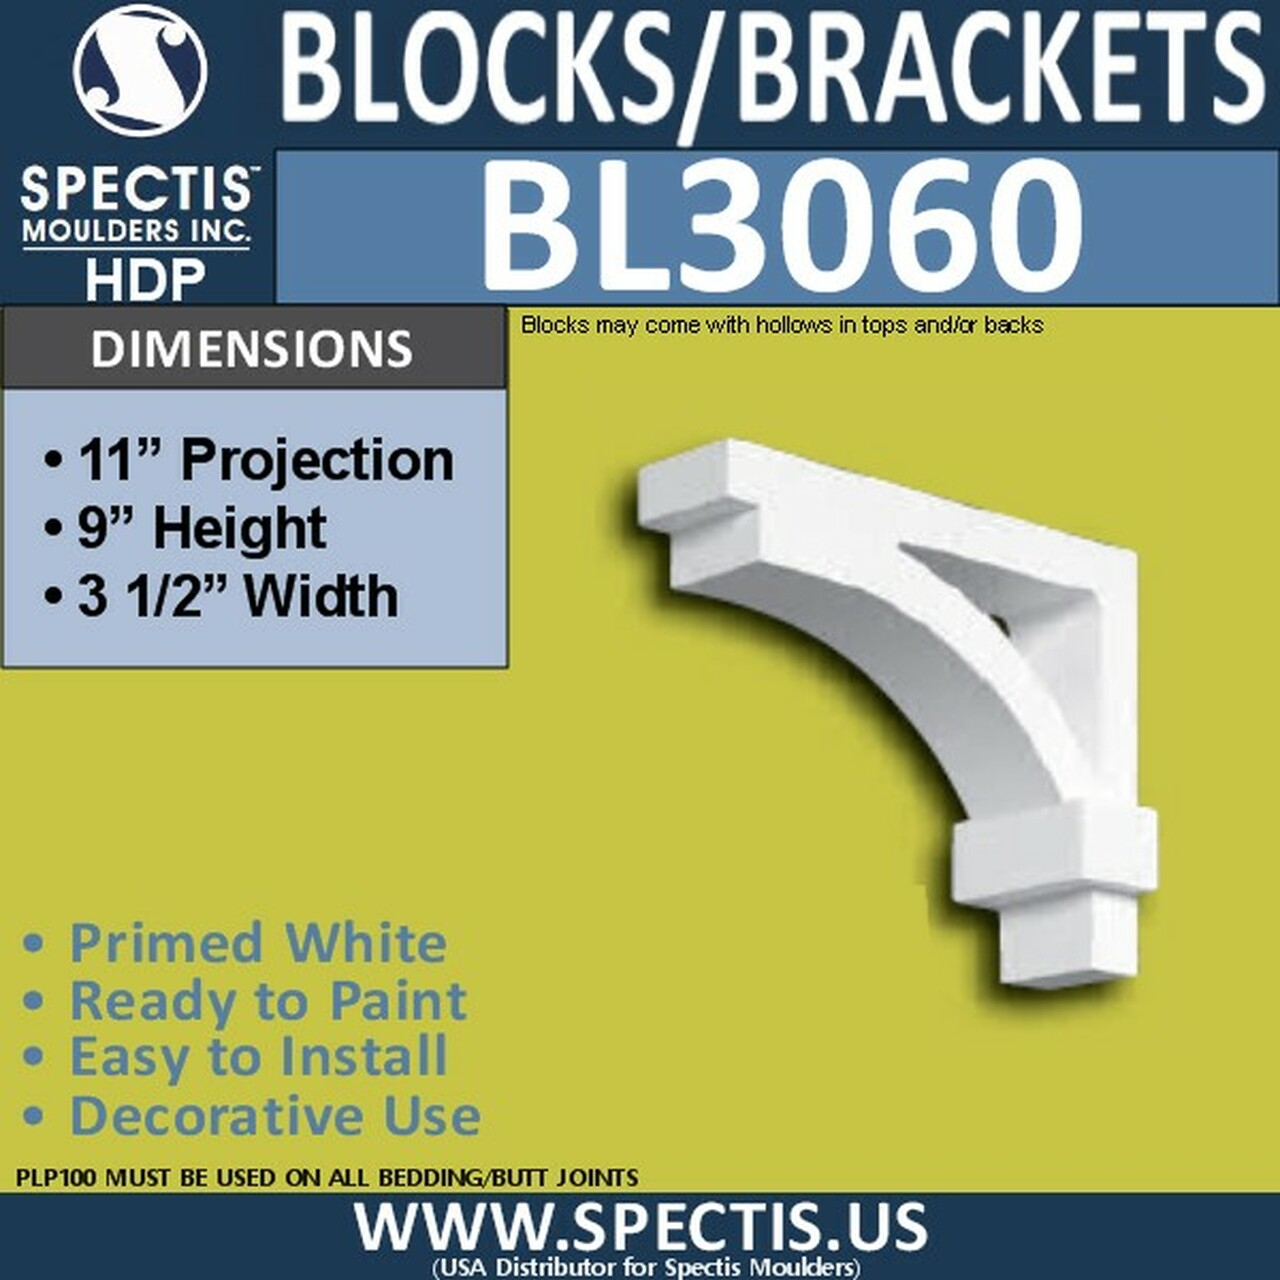 "BL3060 Eave Block or Bracket 3.5""W x 11""H x 9"" P"